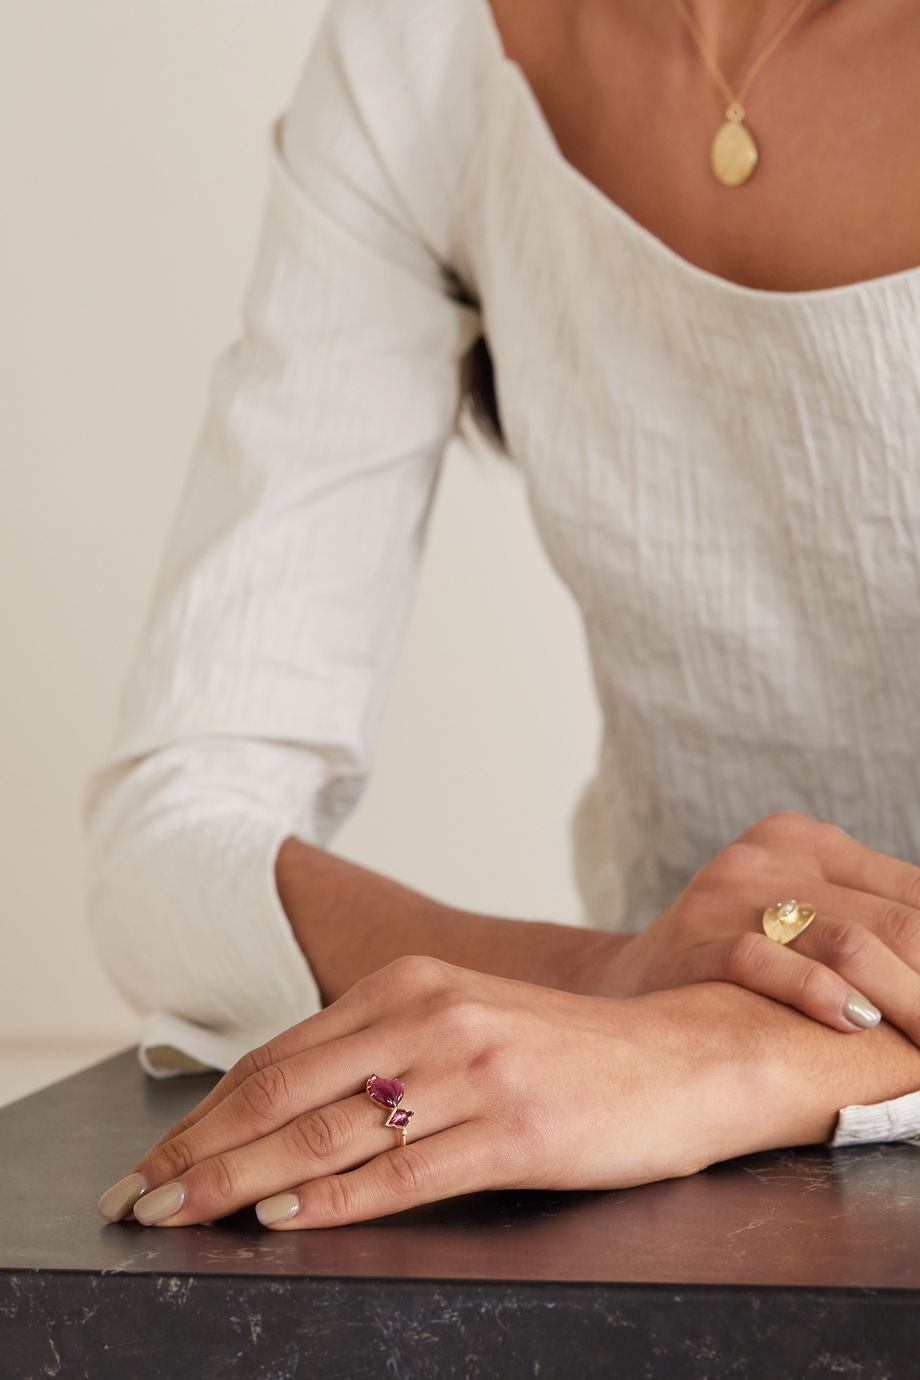 Brooke Gregson Maya 18-karat gold, tourmaline, spinel and diamond ring